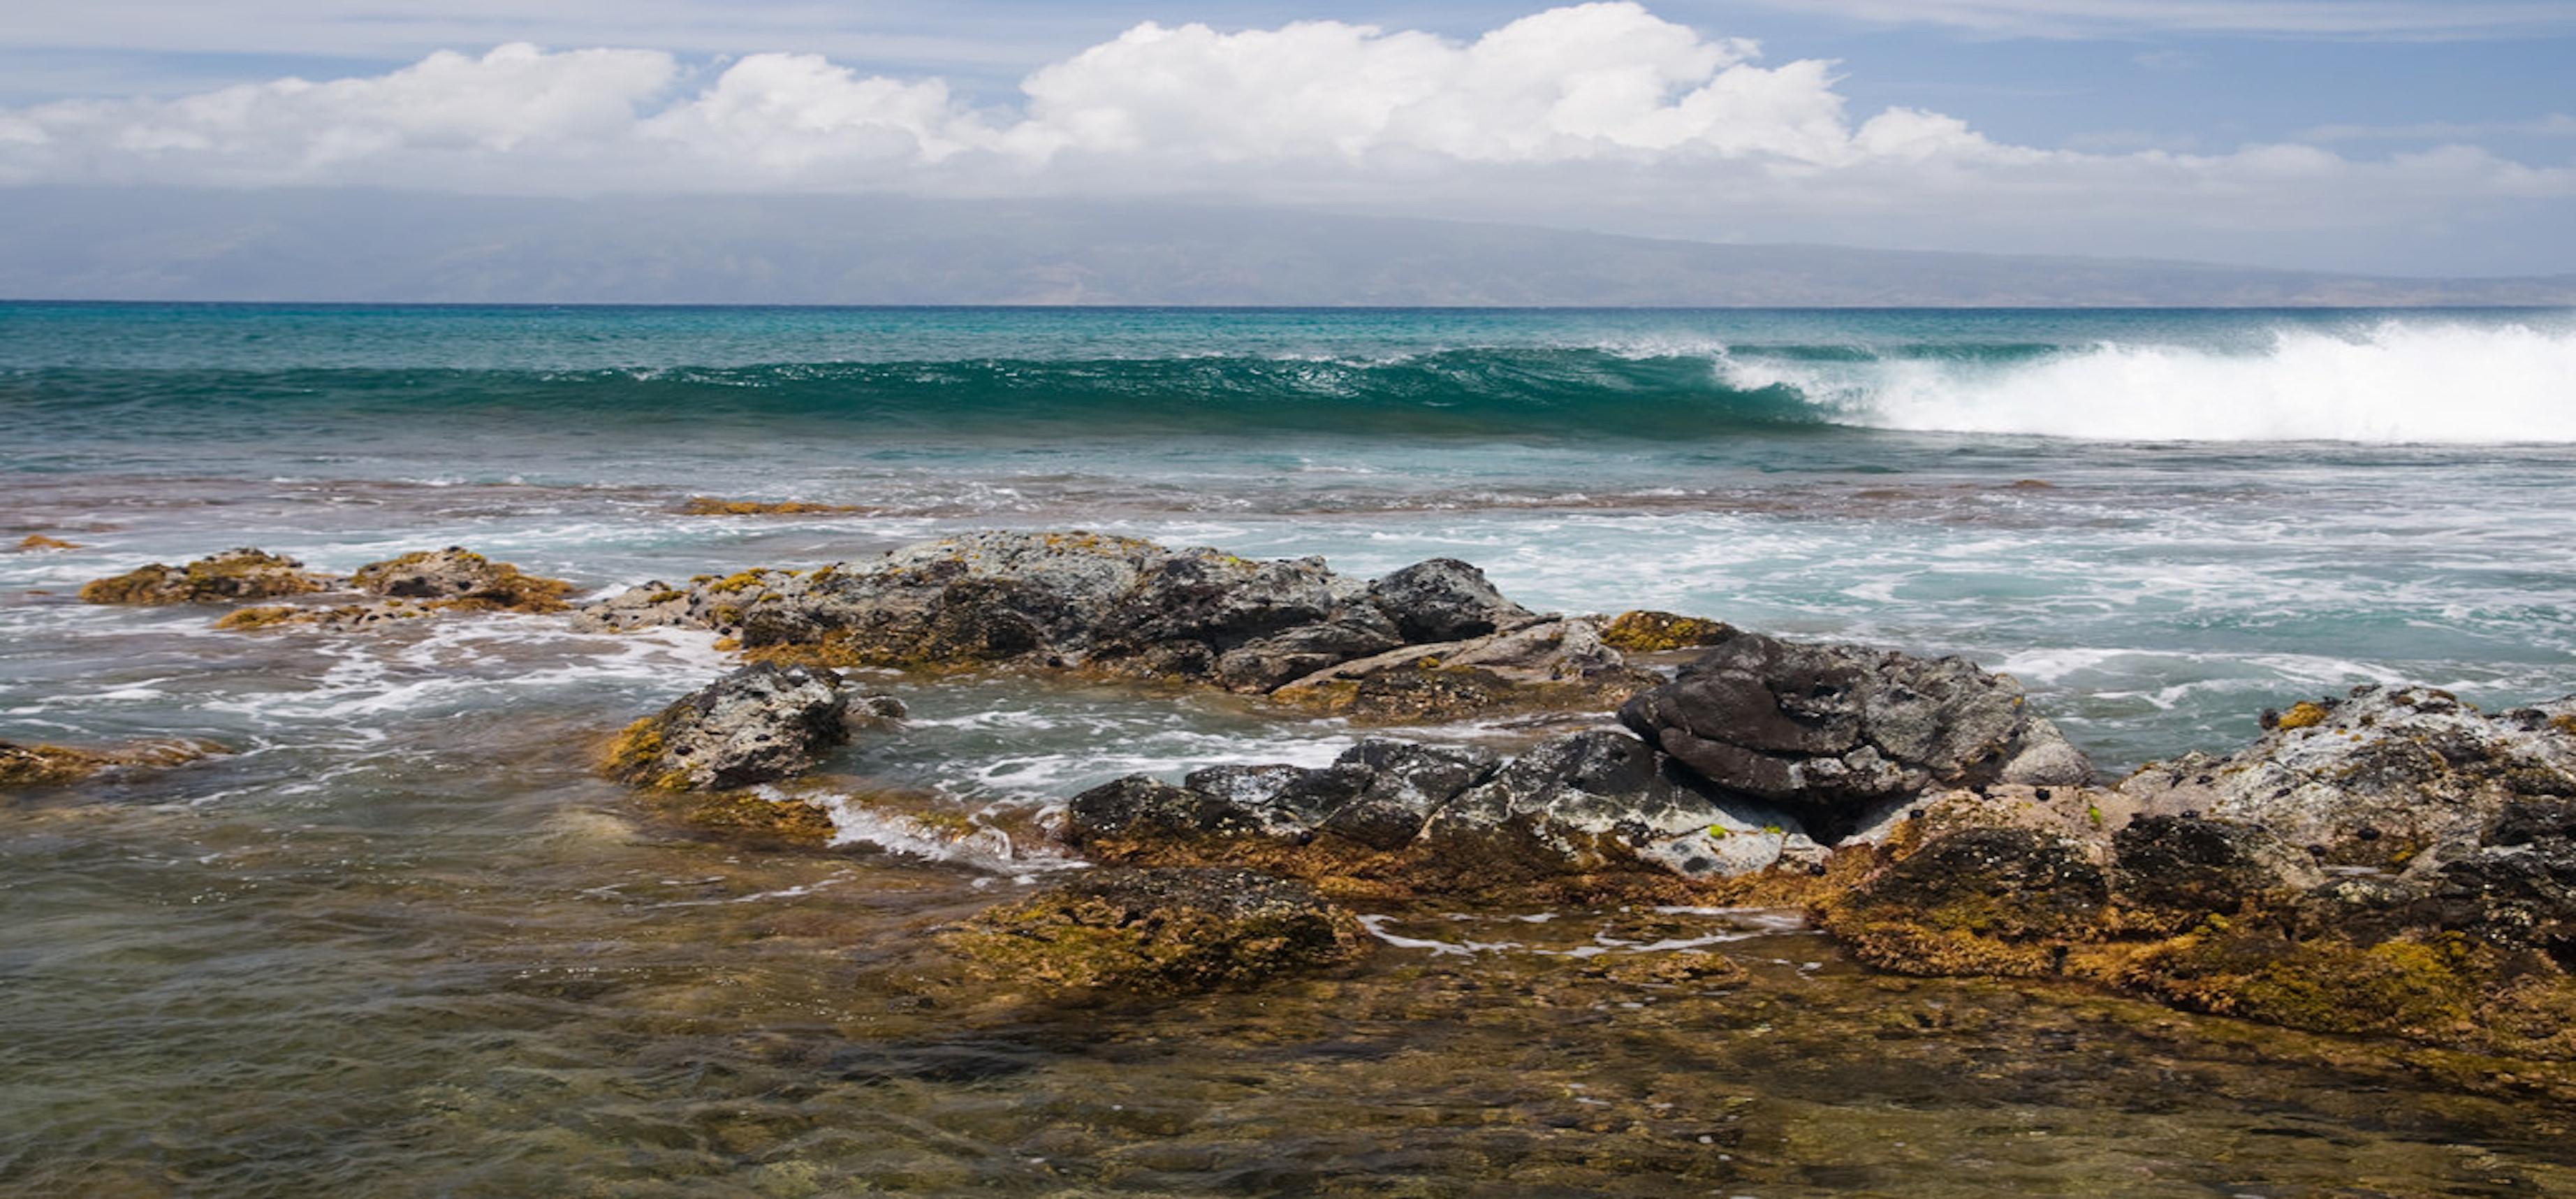 Kaanapali Beach Rentals - Maui - Bruce Irschick via Flickr